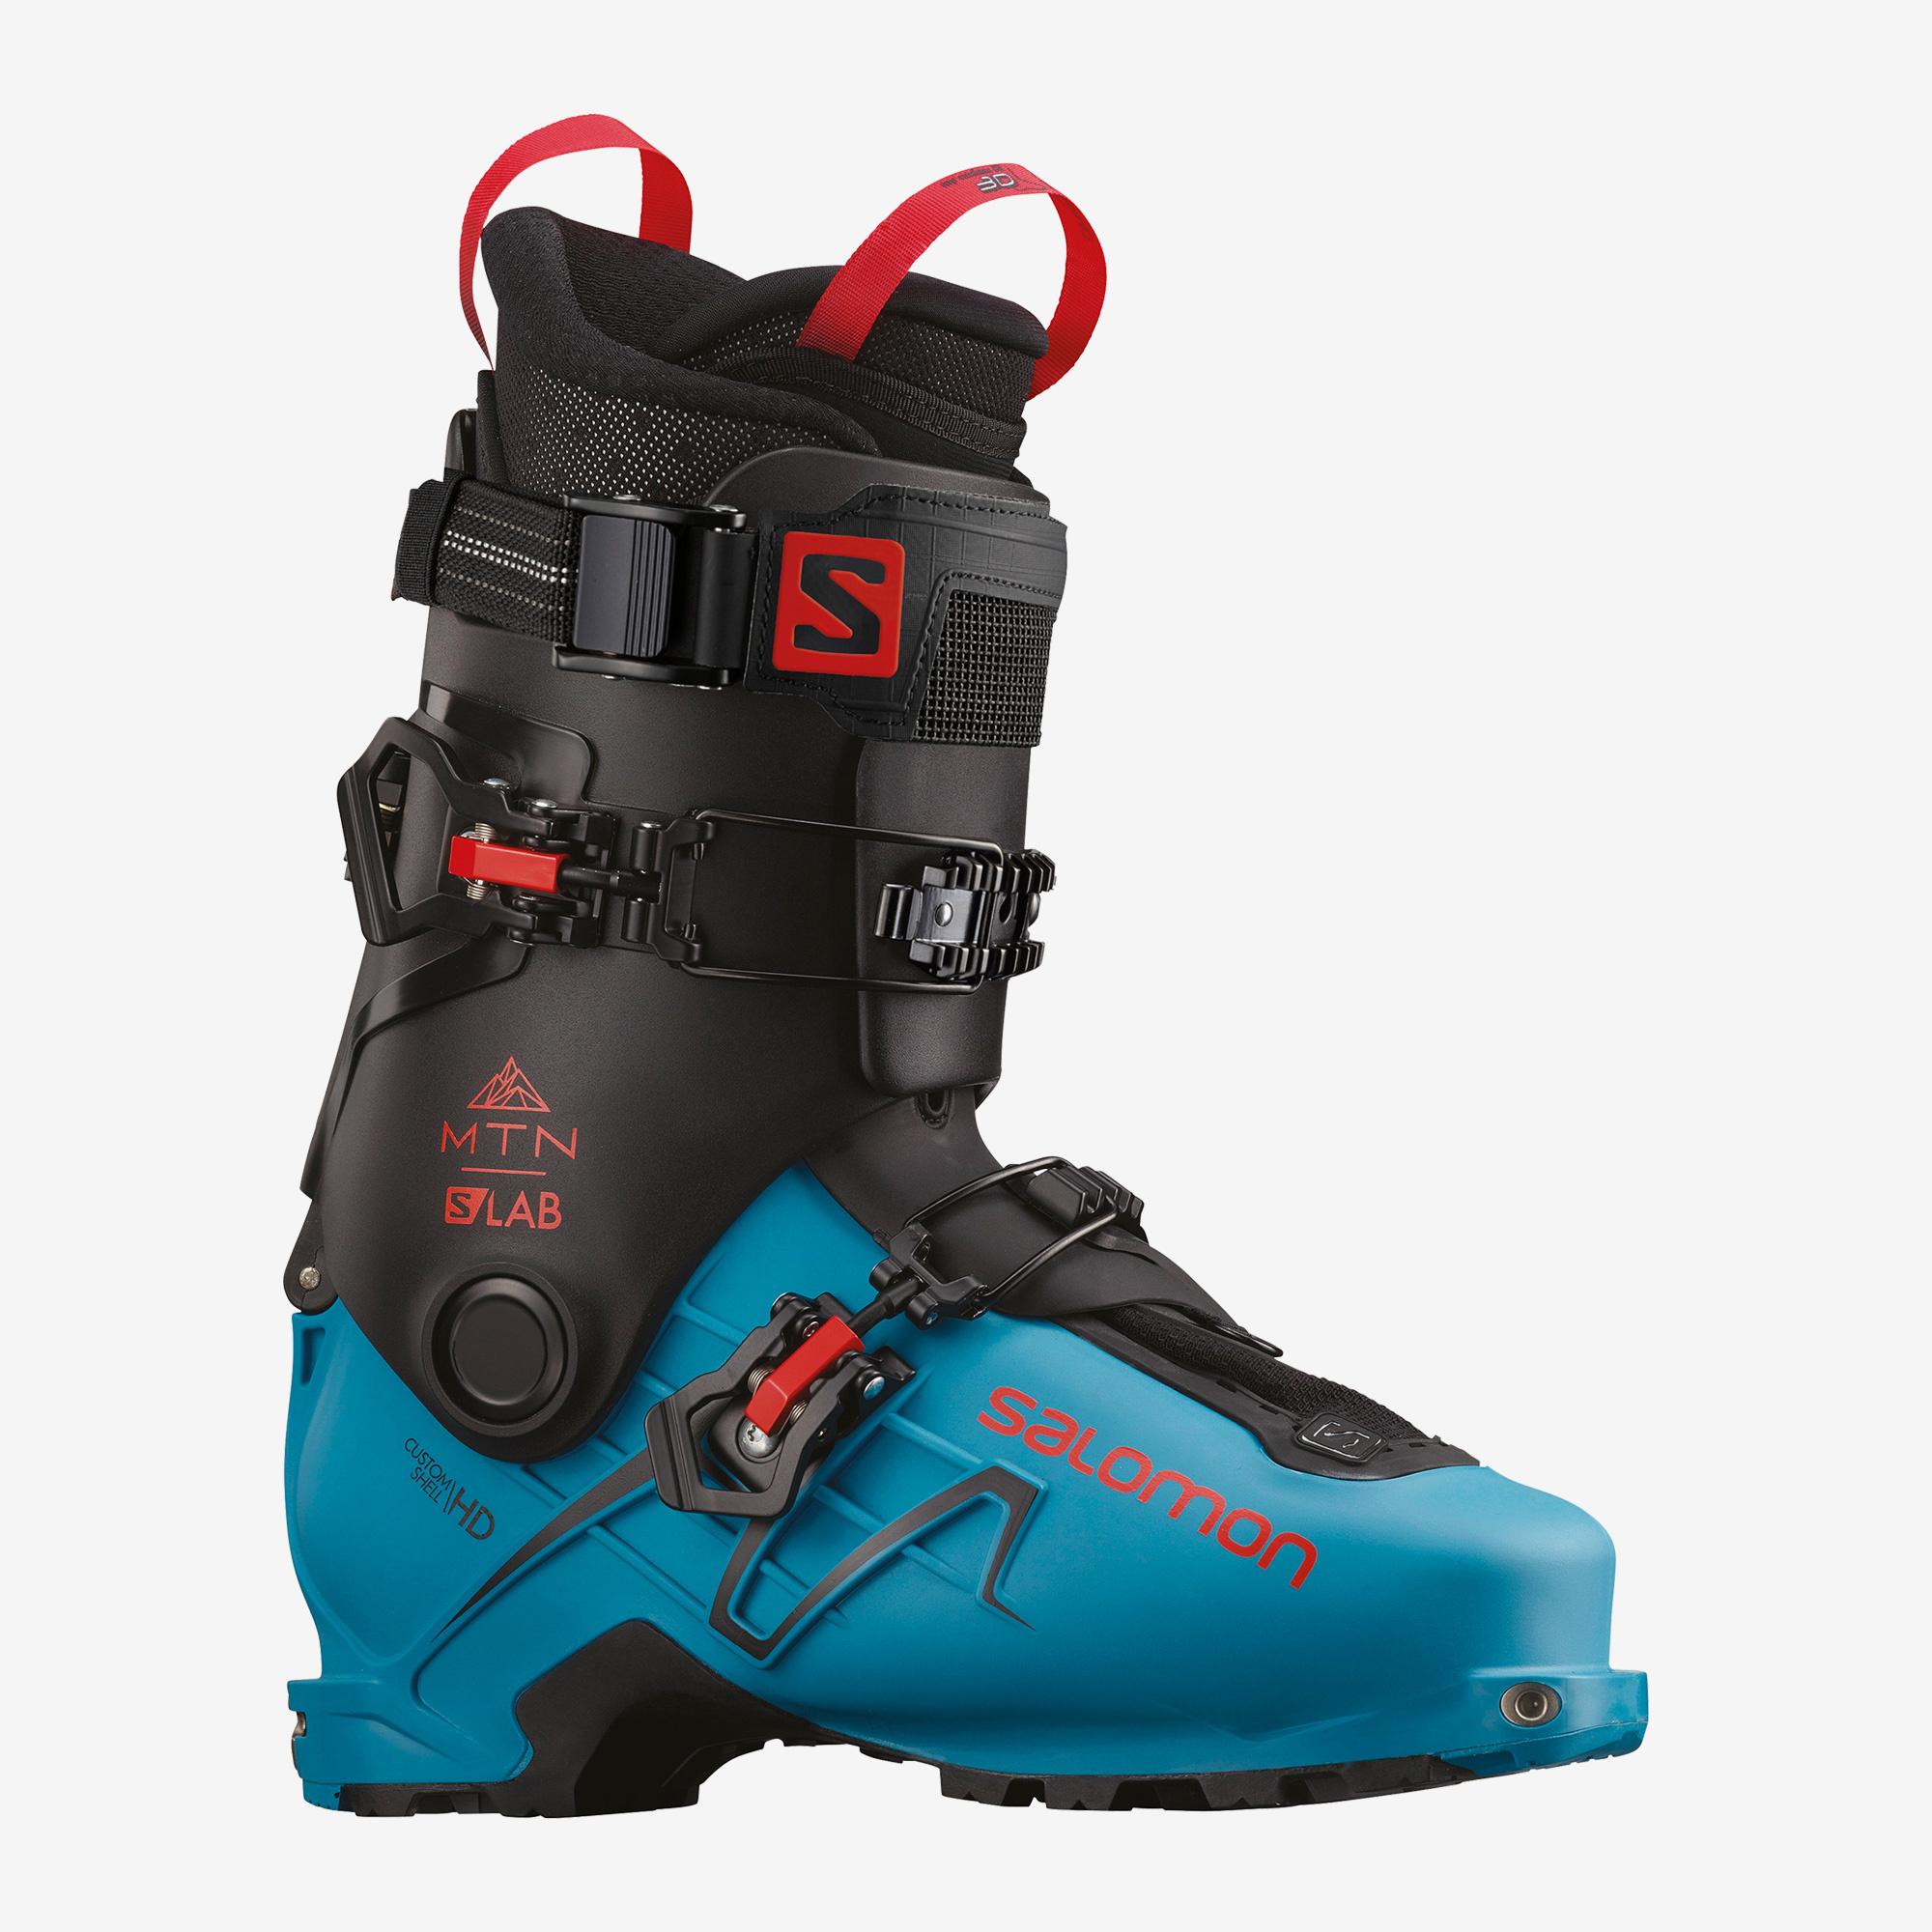 S/LAB MTN Boot-1